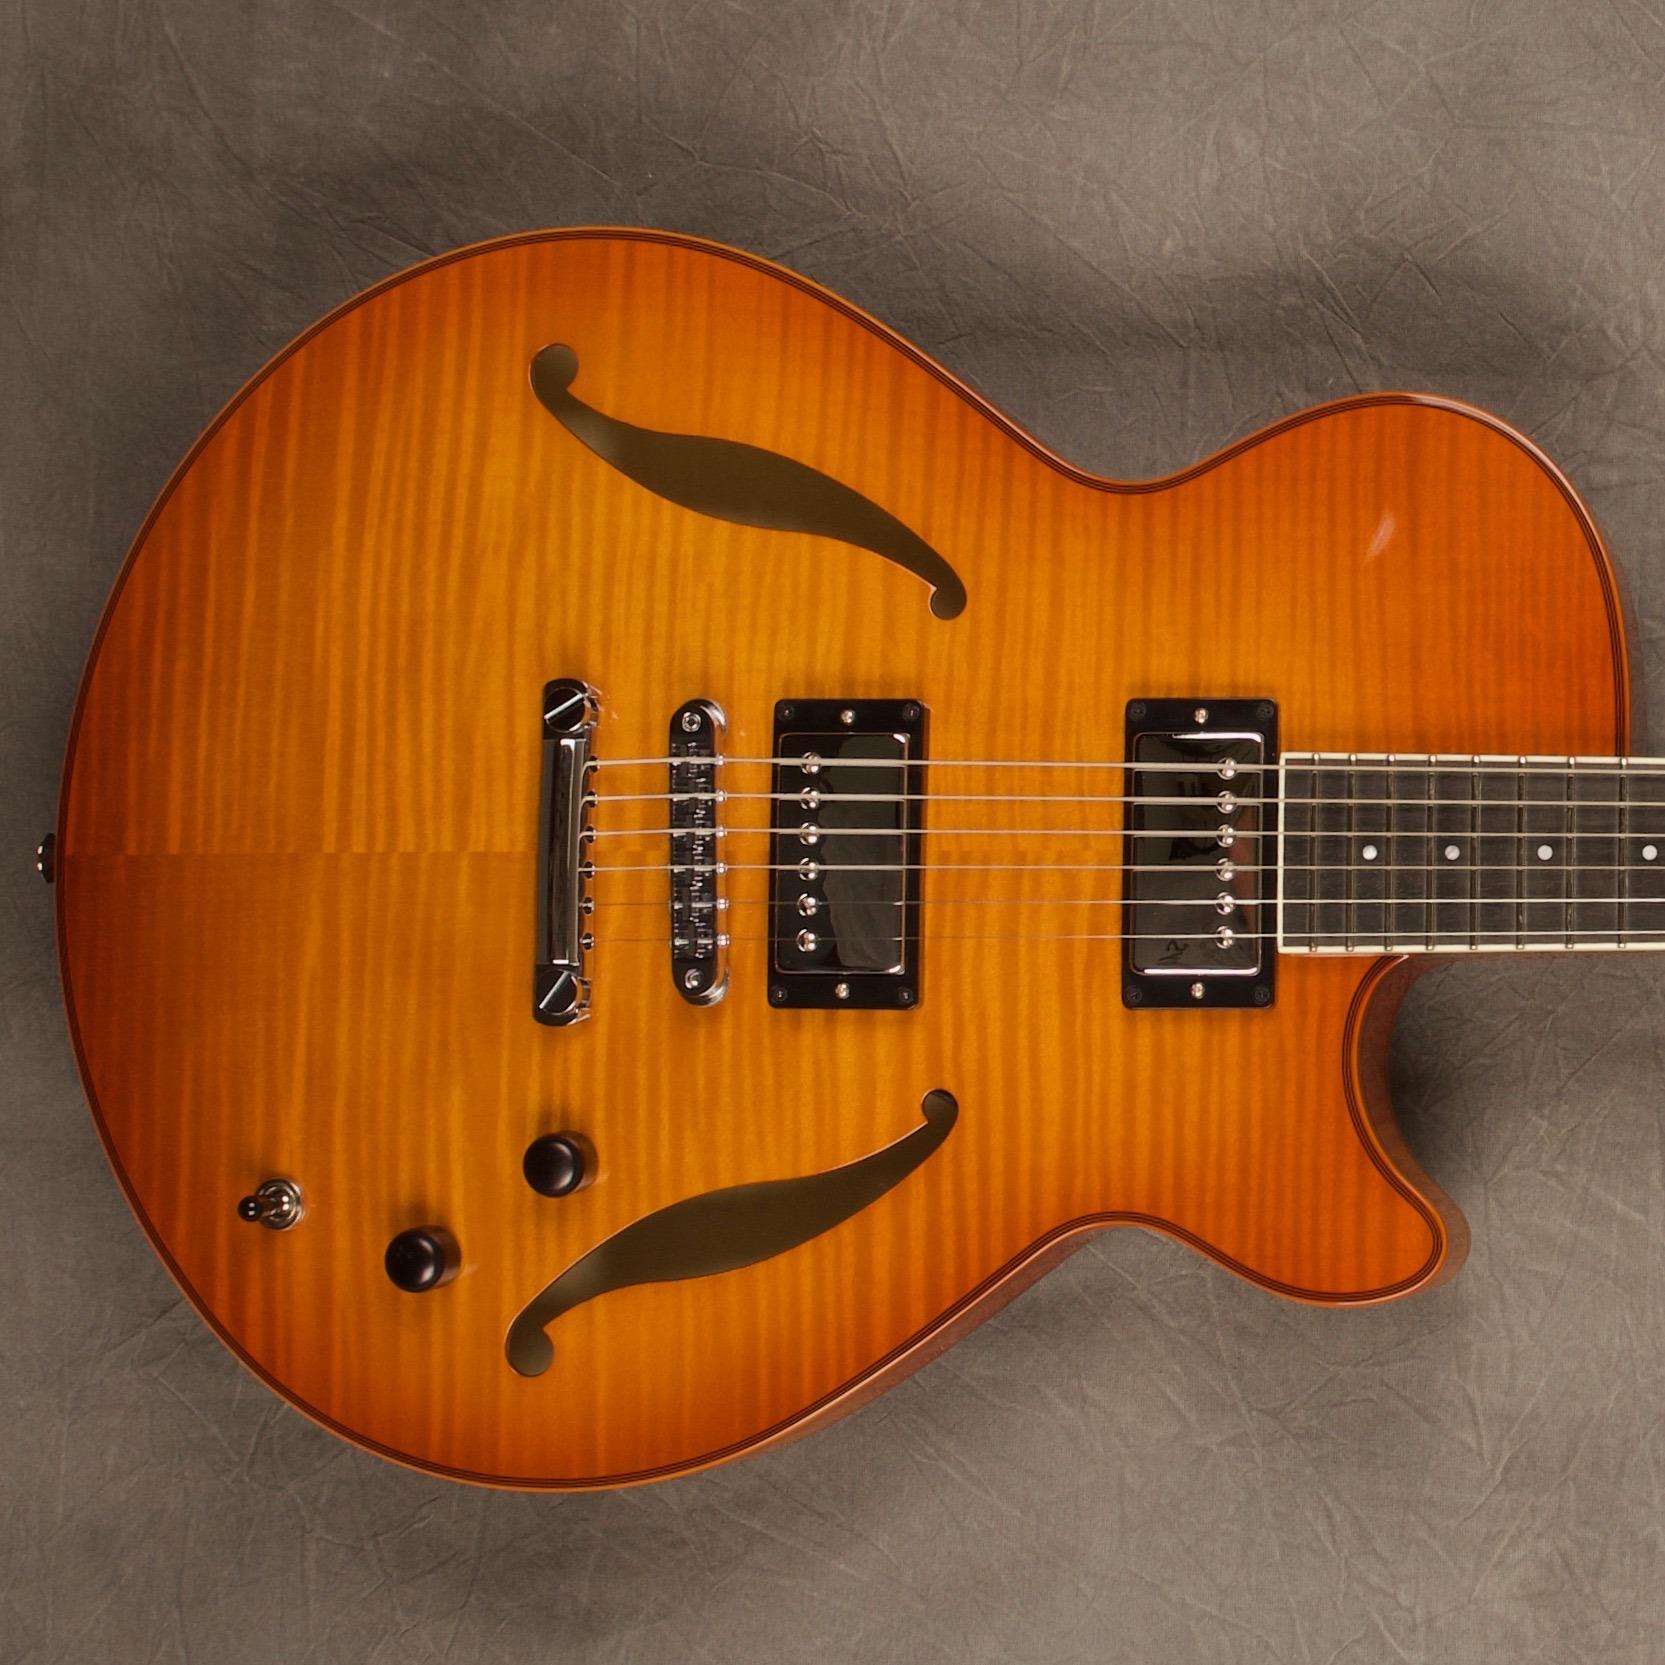 a1794 violin burst semi hollow archtop guitar sadowsky guitars. Black Bedroom Furniture Sets. Home Design Ideas